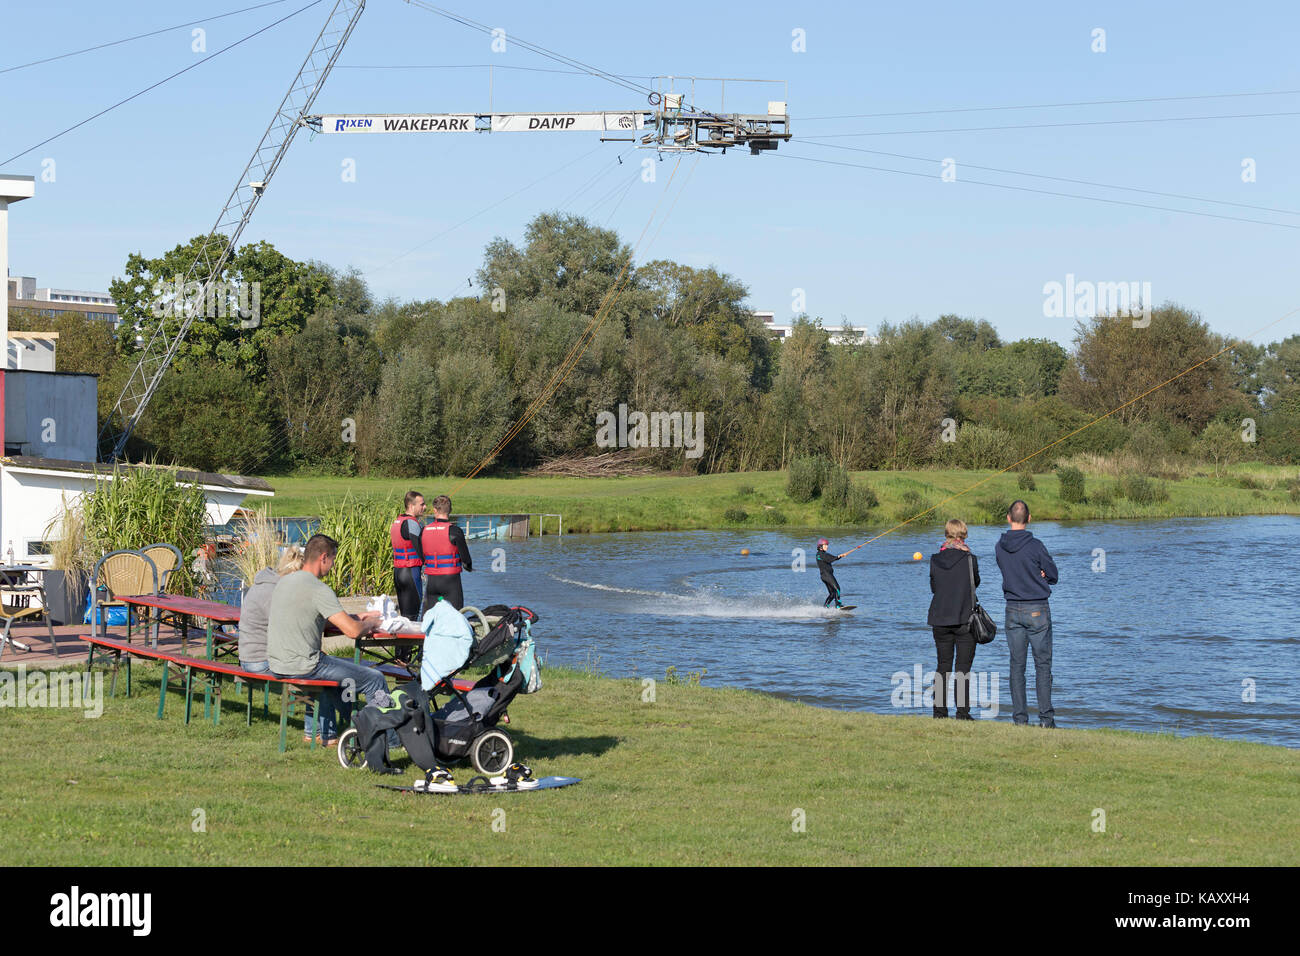 Wakepark, Baltic Sea Spa Damp, Schleswig-Holstein, Germany - Stock Image